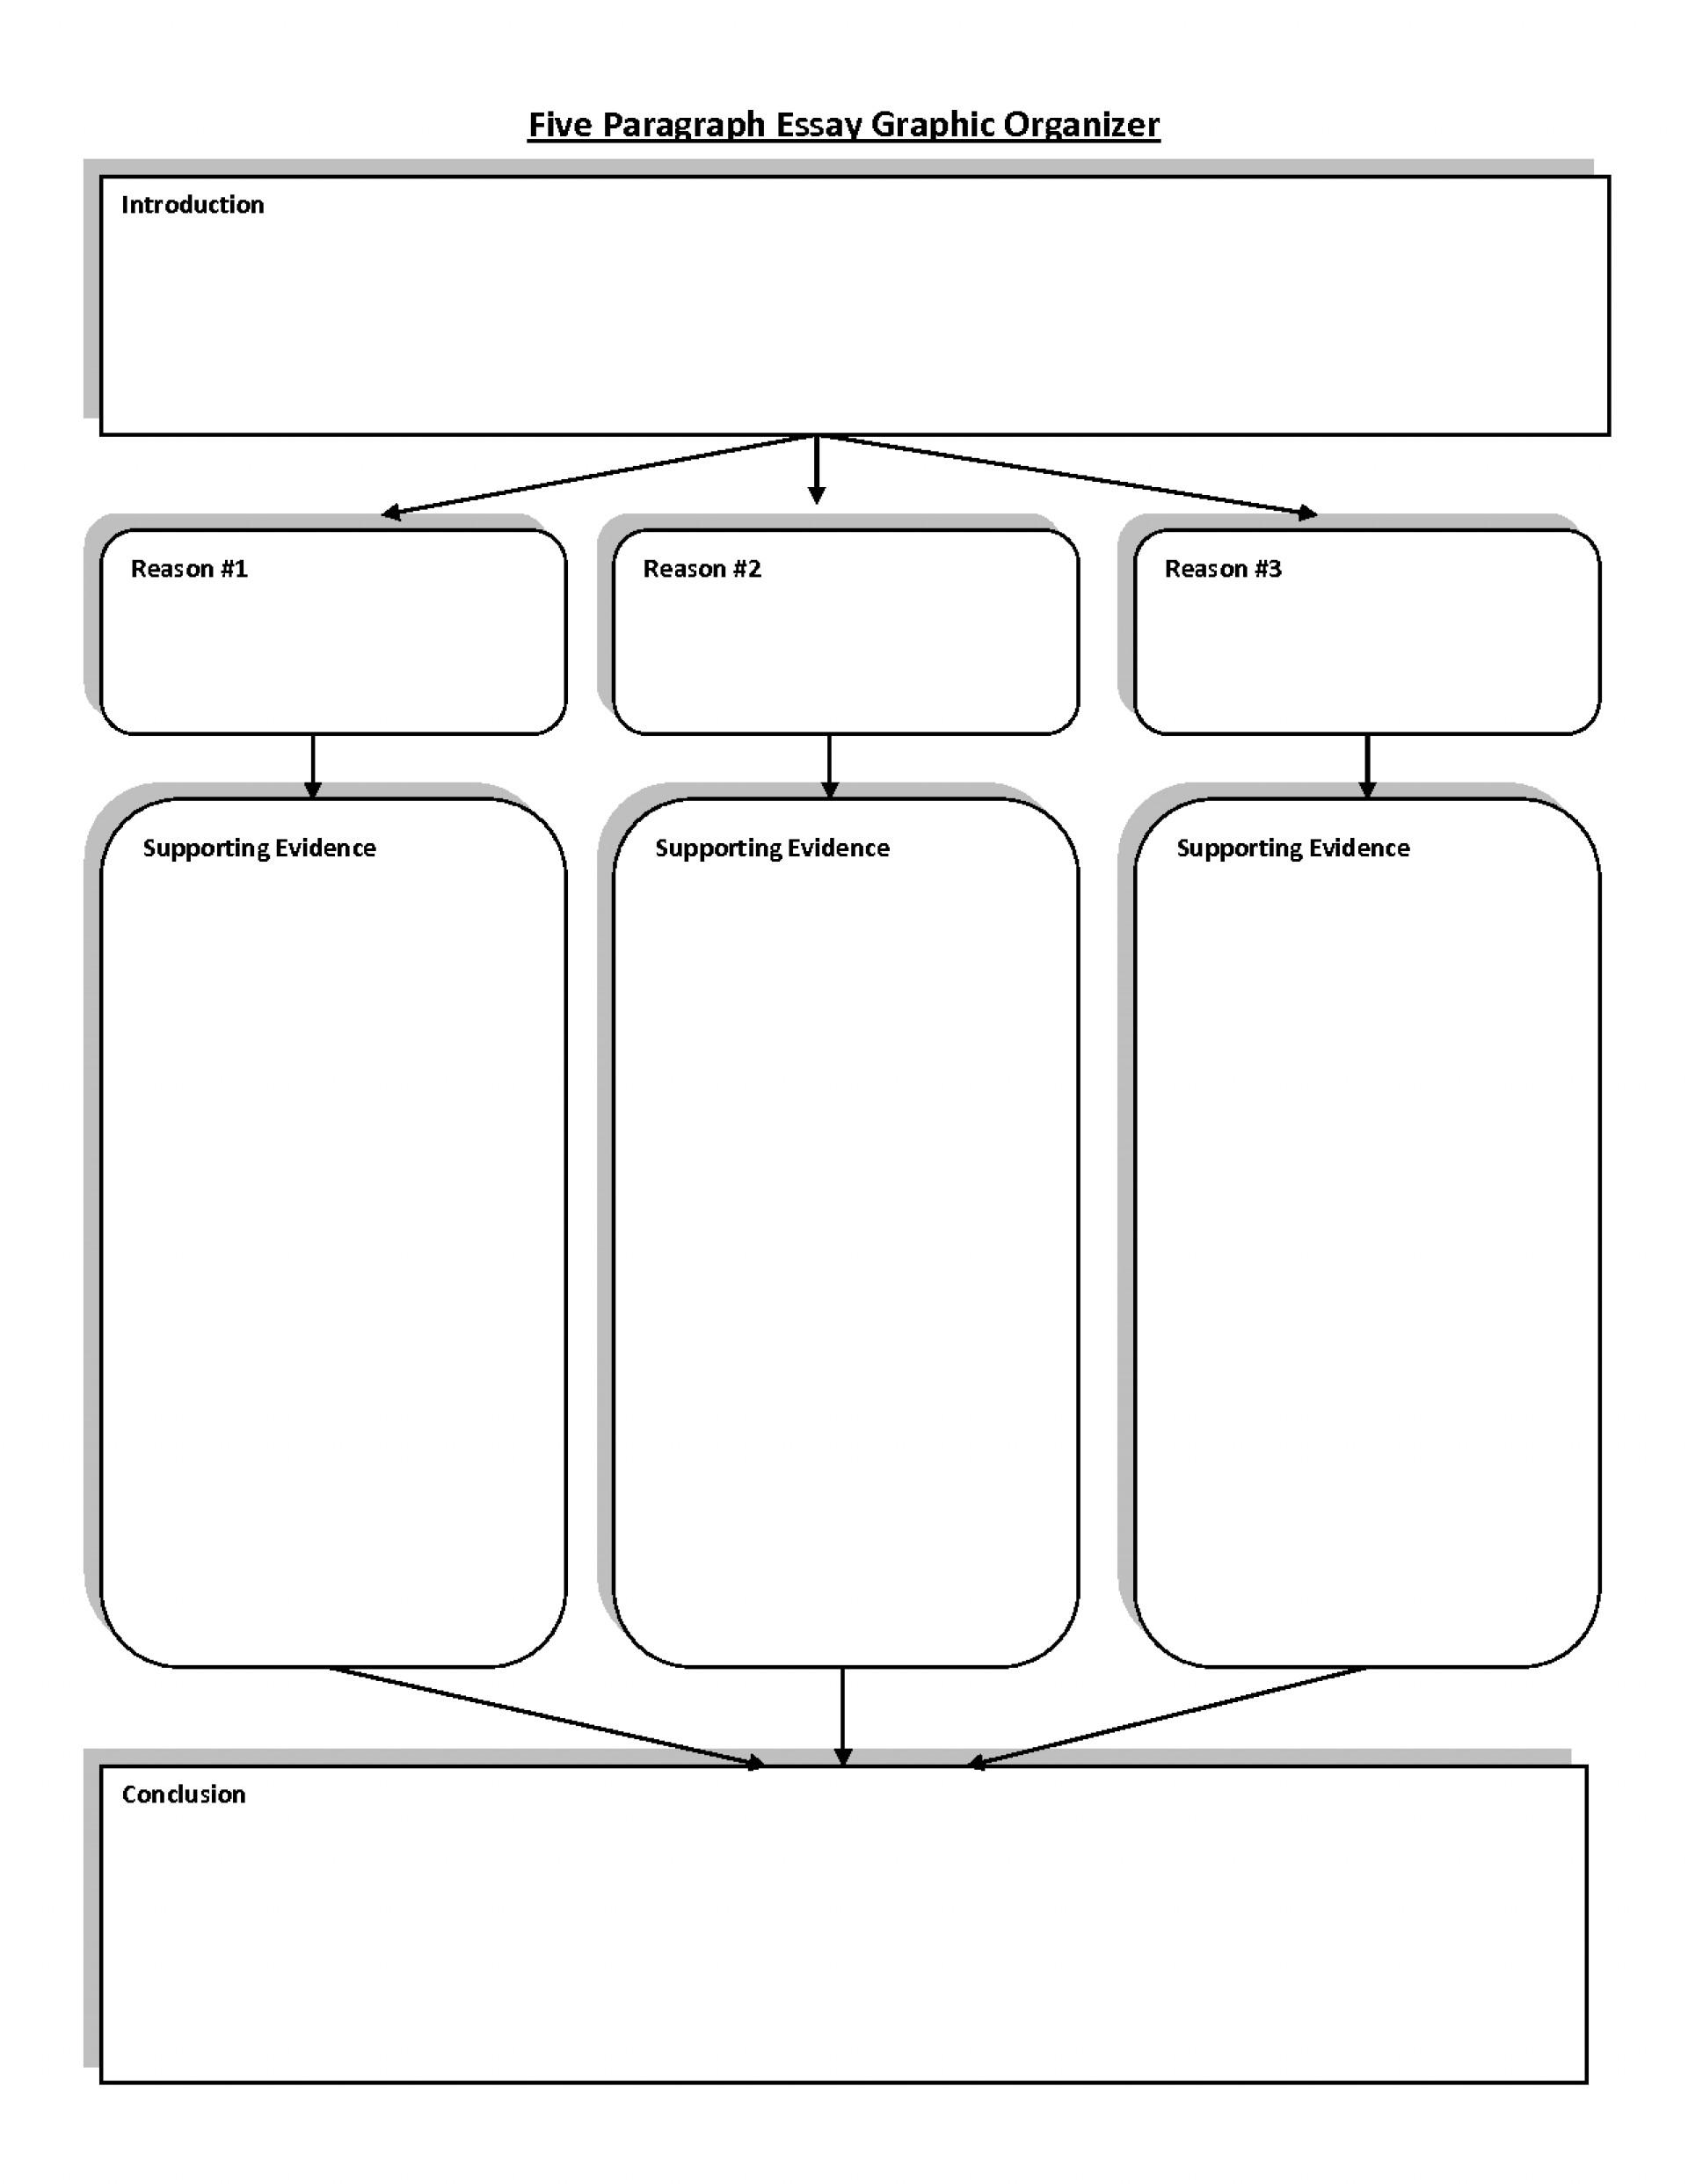 007 Para Organizer Persuasive Essay Graphic Amazing Argumentative Middle School Pdf Writing 5th Grade Answers 1920